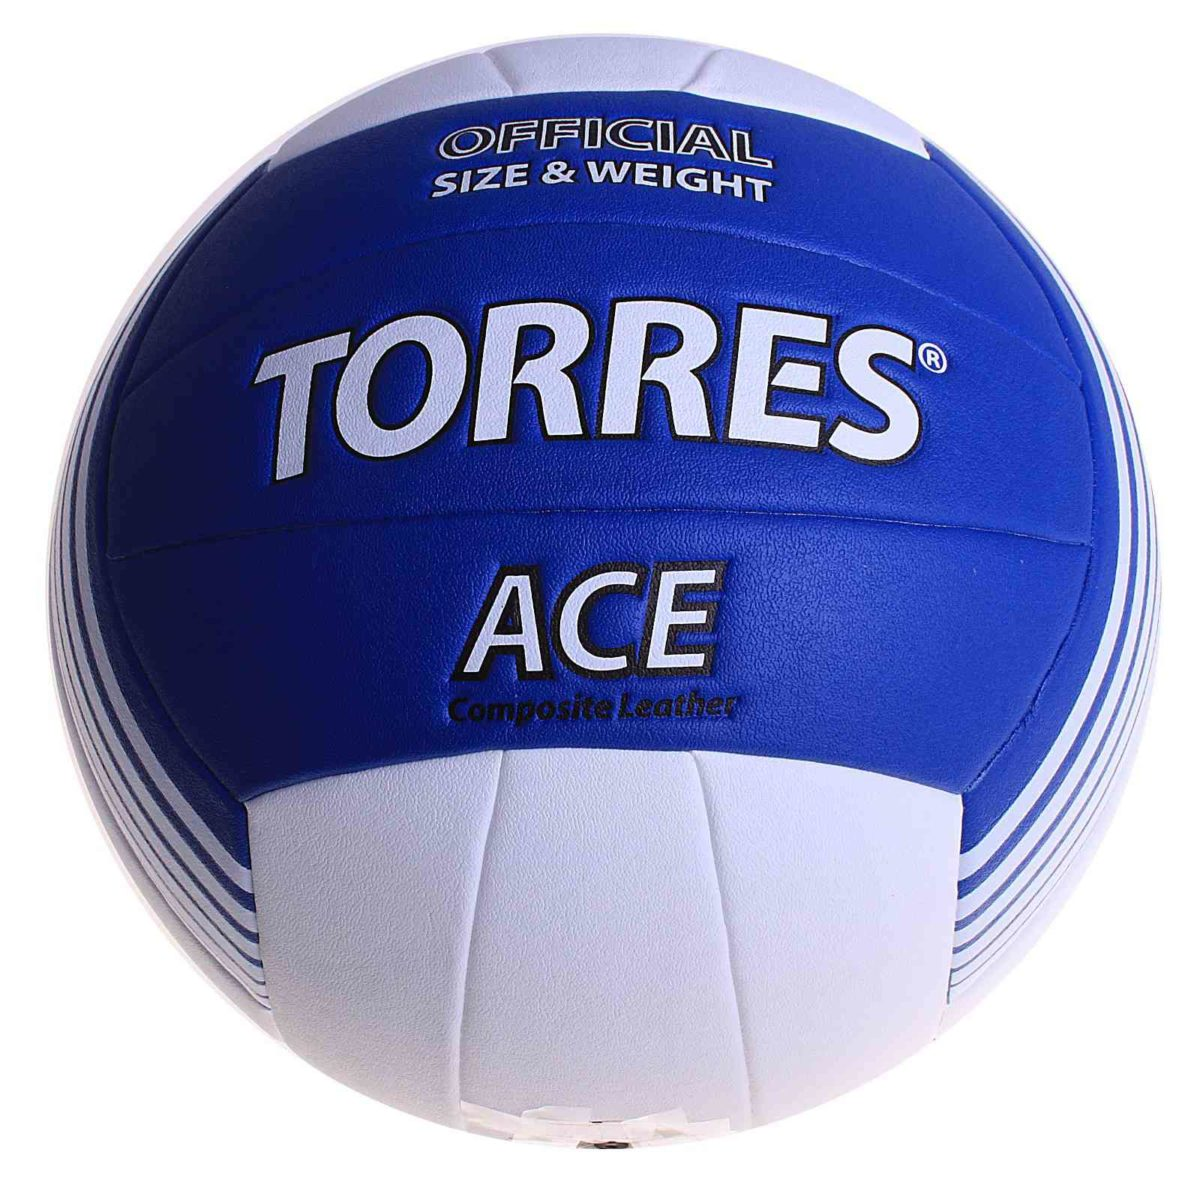 TORRES Ace Мяч волейбольный V40065 №5 - 1